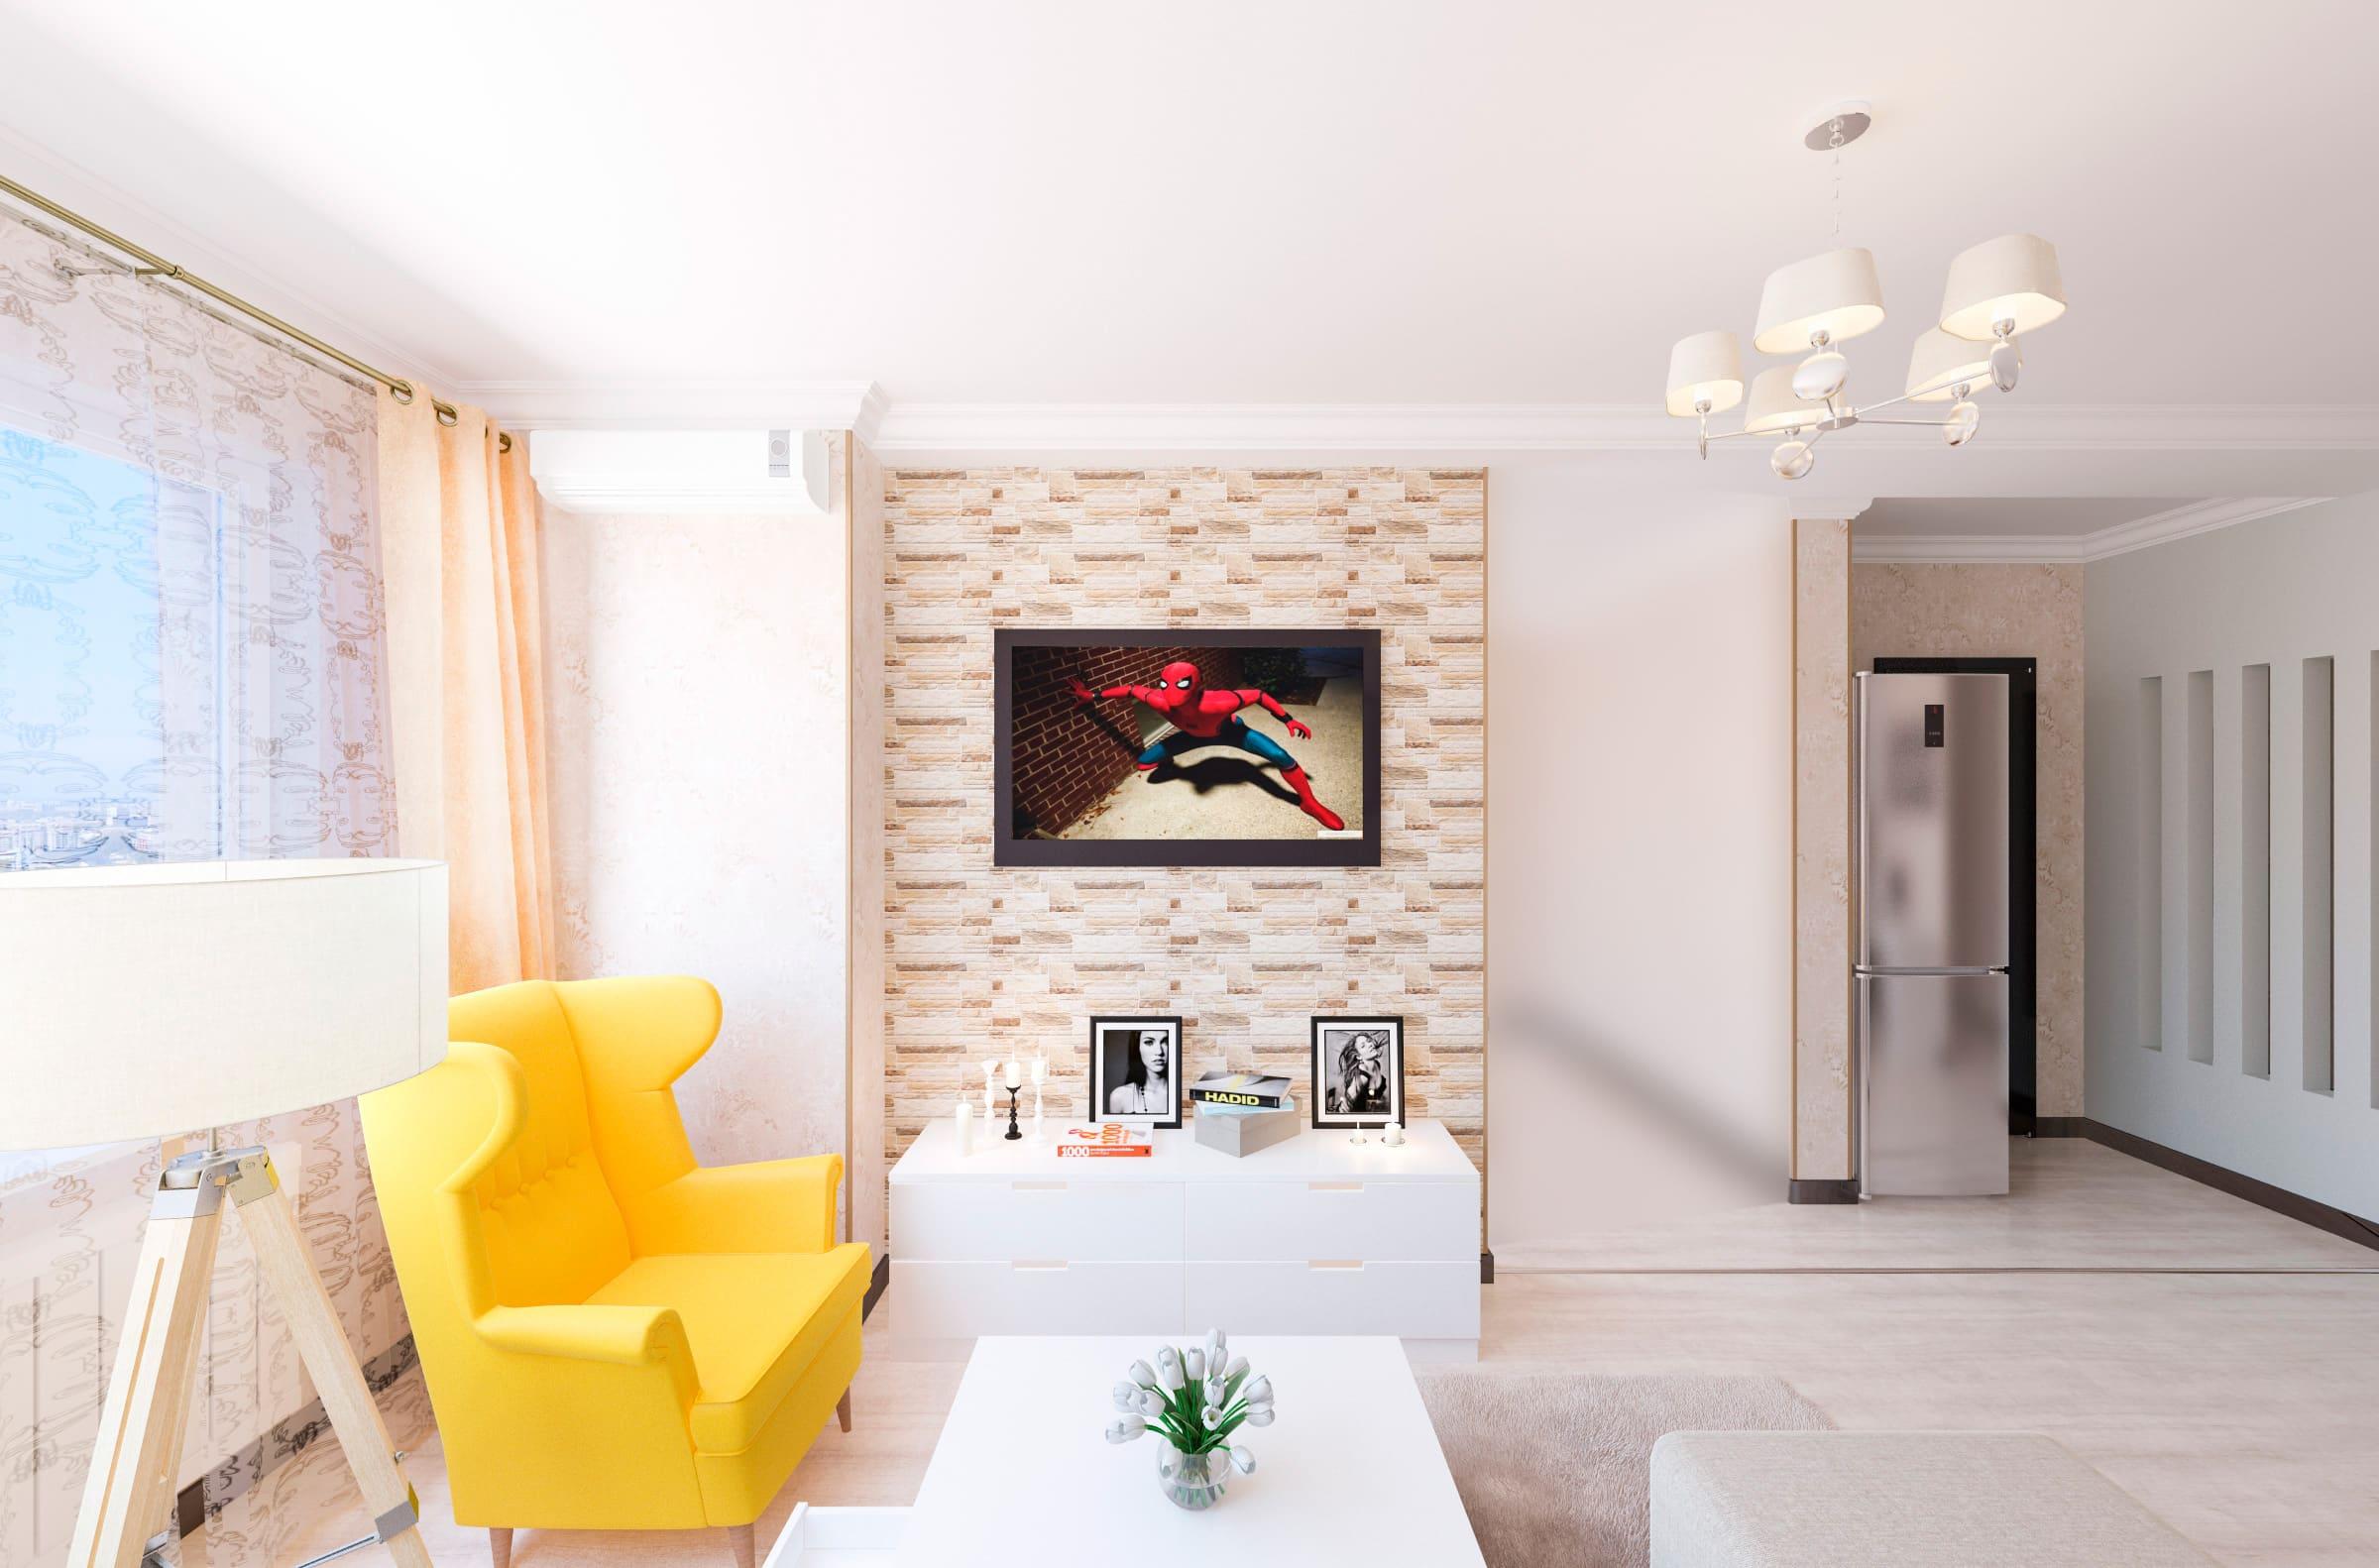 дизайн интерьера вид на телевизор